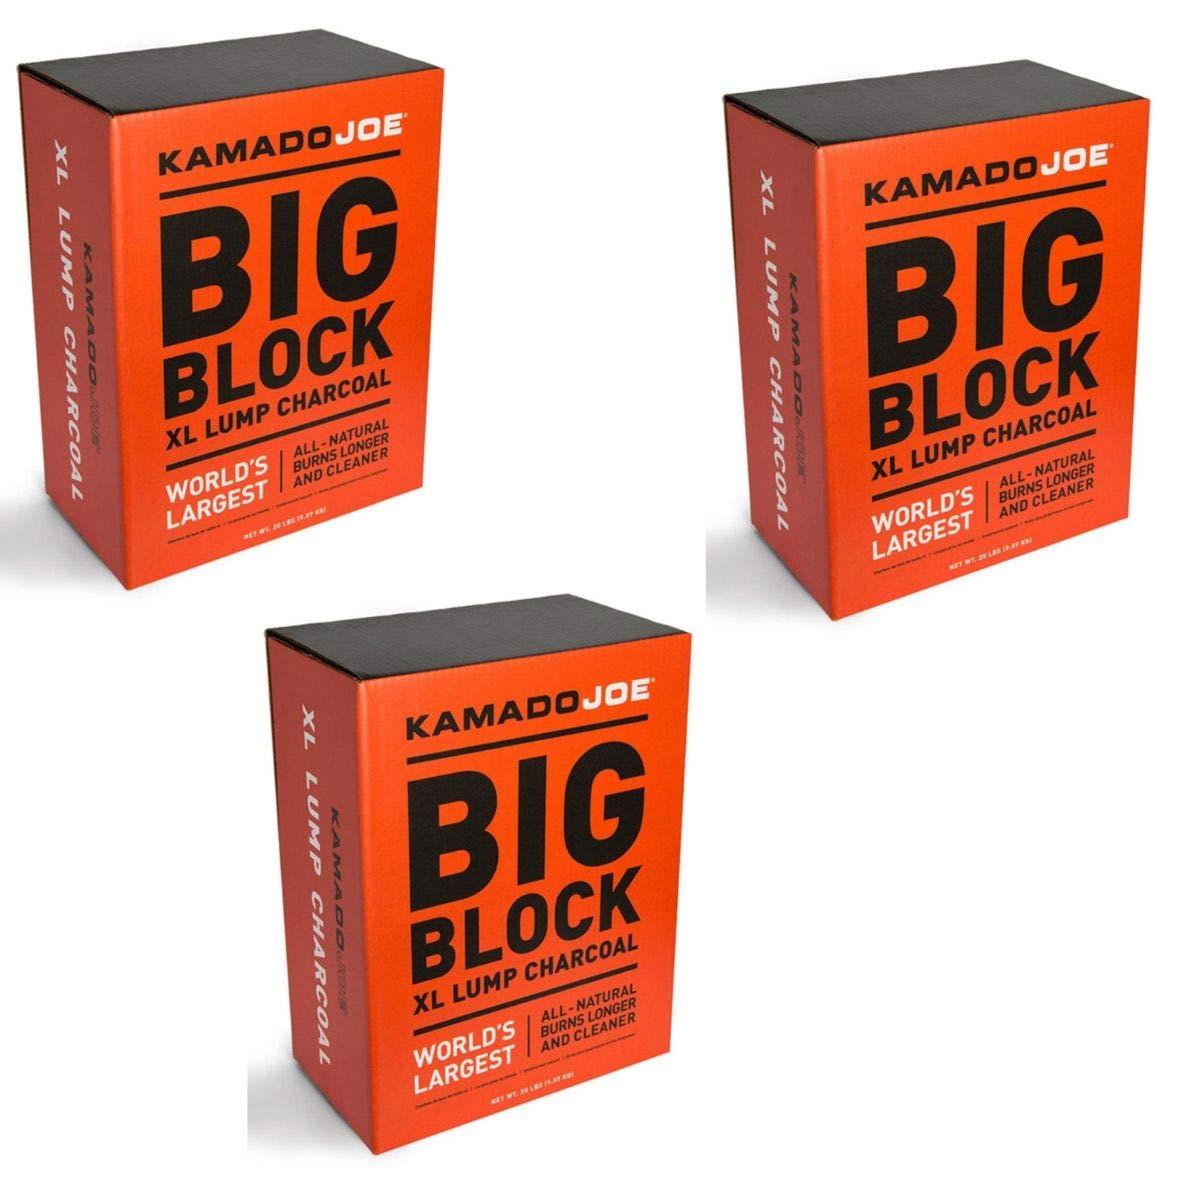 Kamado Joe KJ-Char Hardwood Lump Charcoal, Extra Large (3 Packs - Extra Large Lump Charcoal)